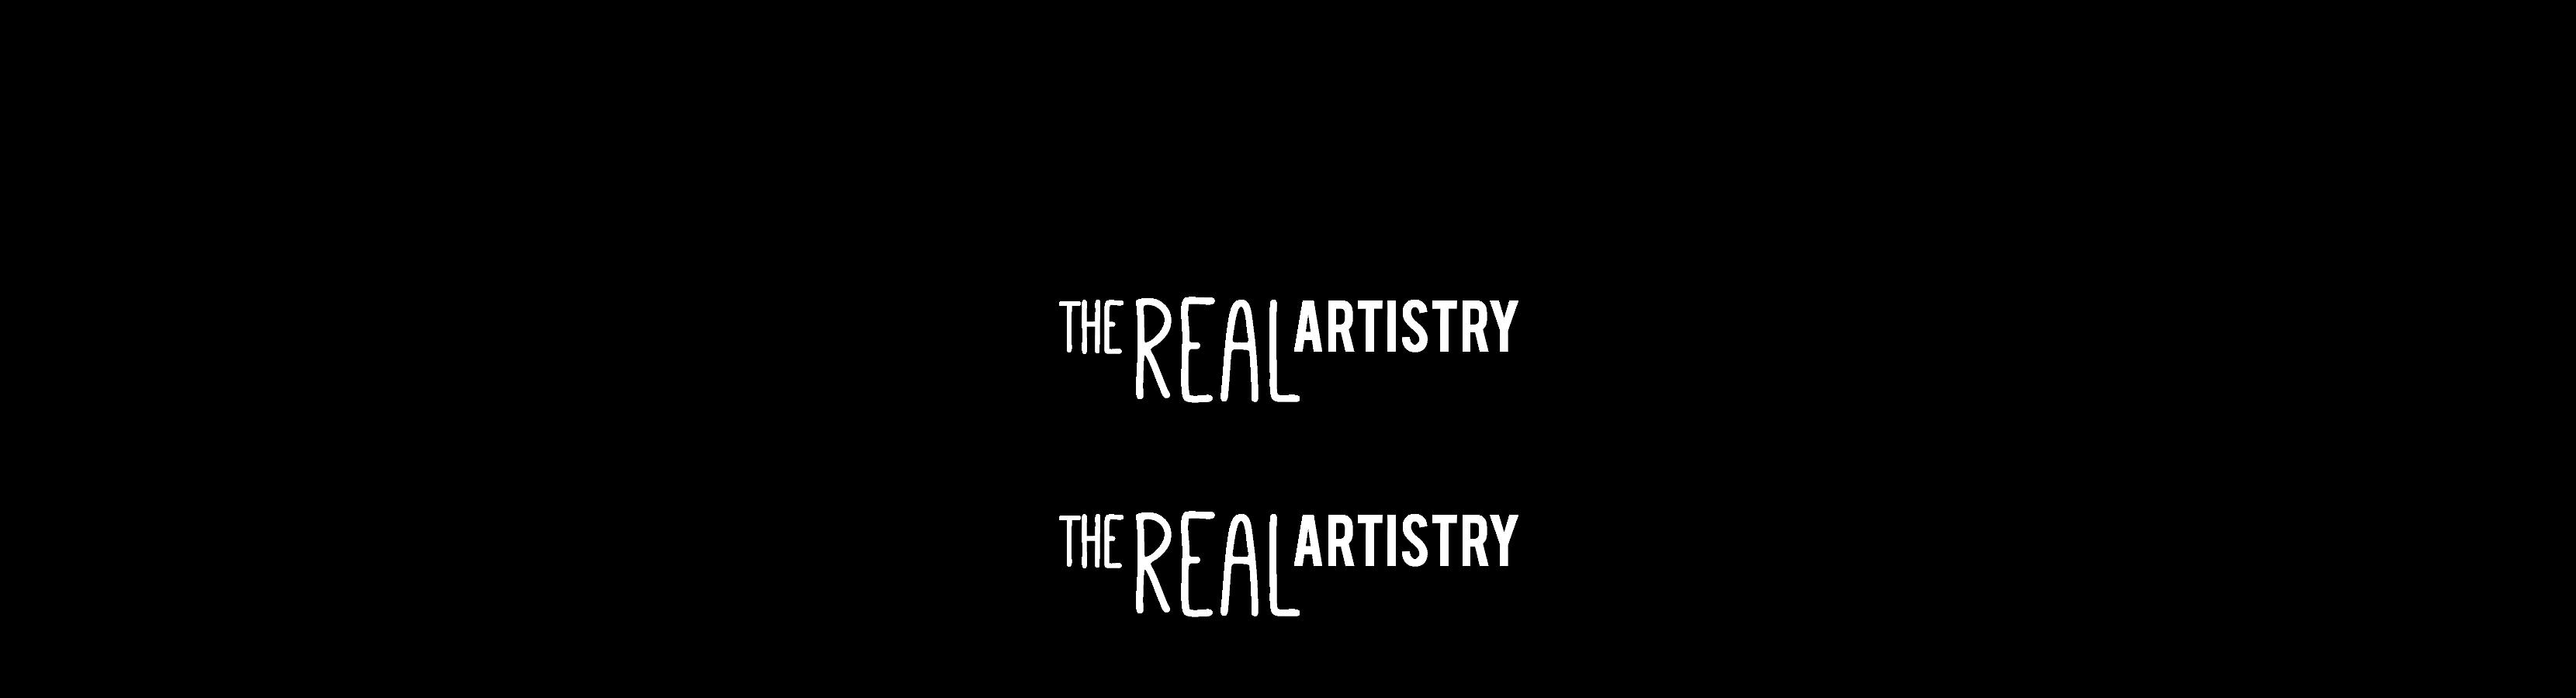 the real artistry slide